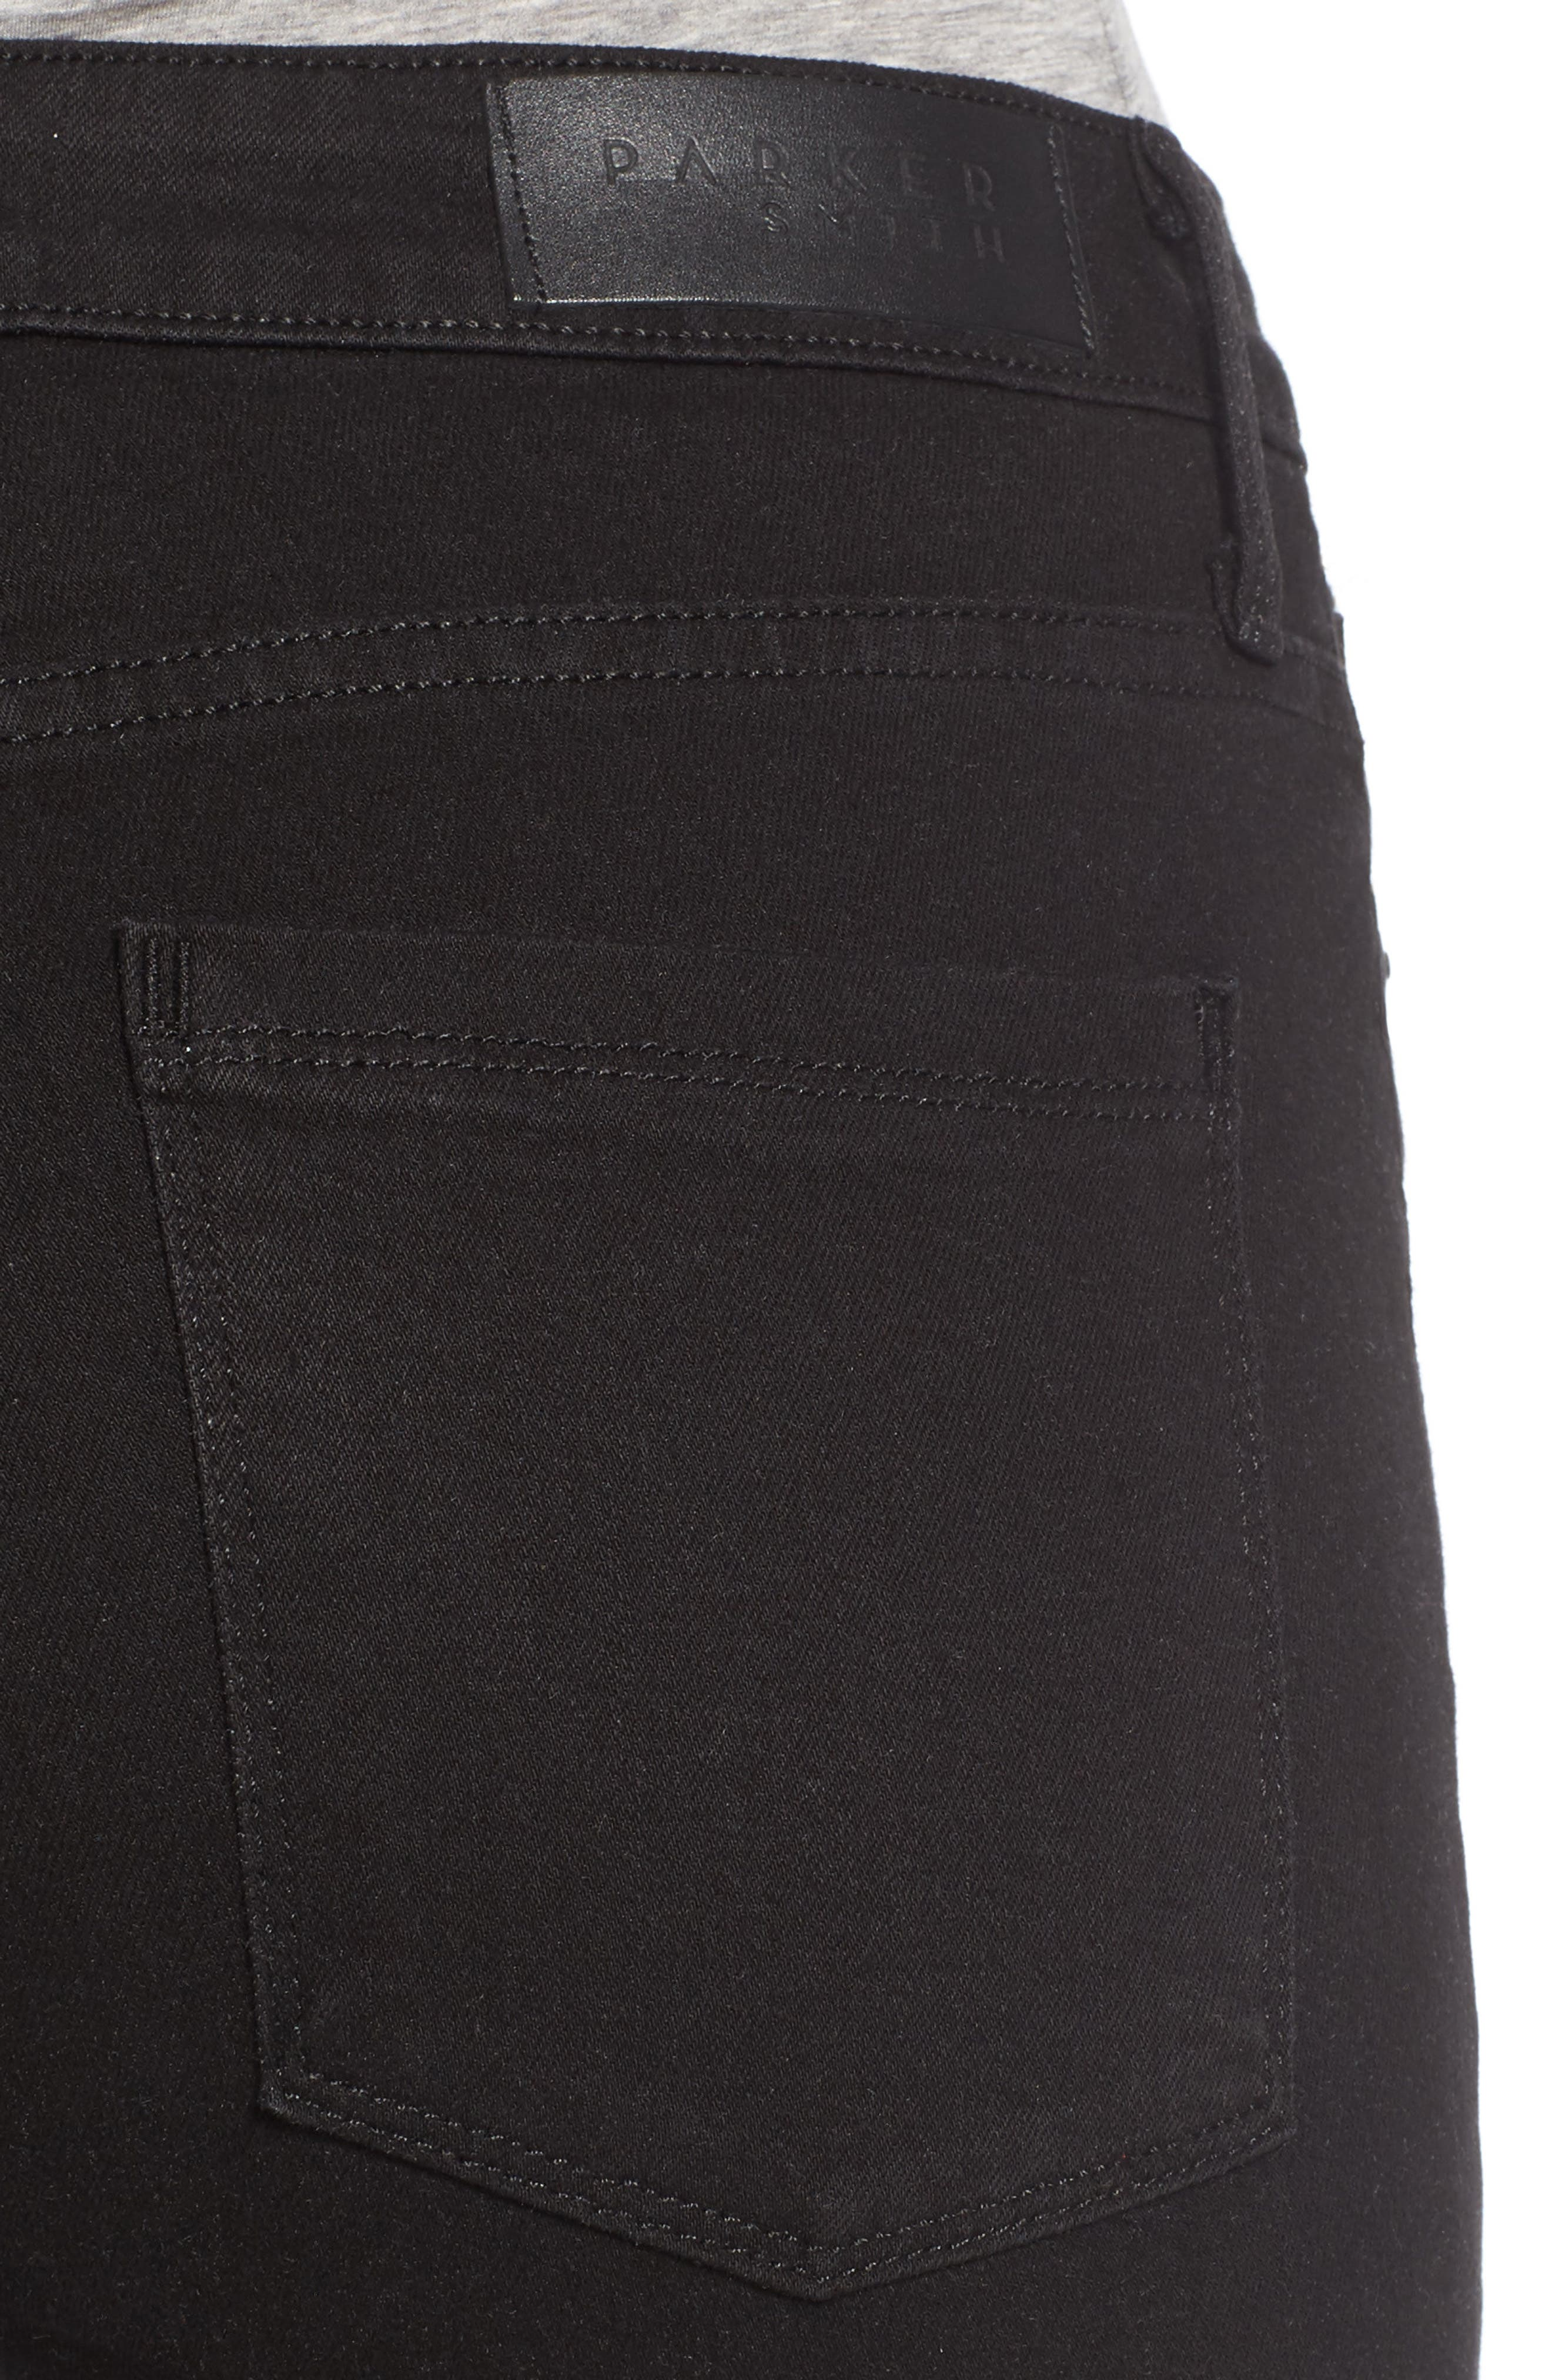 Bombshell High Waist Stretch Skinny Jeans,                             Alternate thumbnail 4, color,                             001